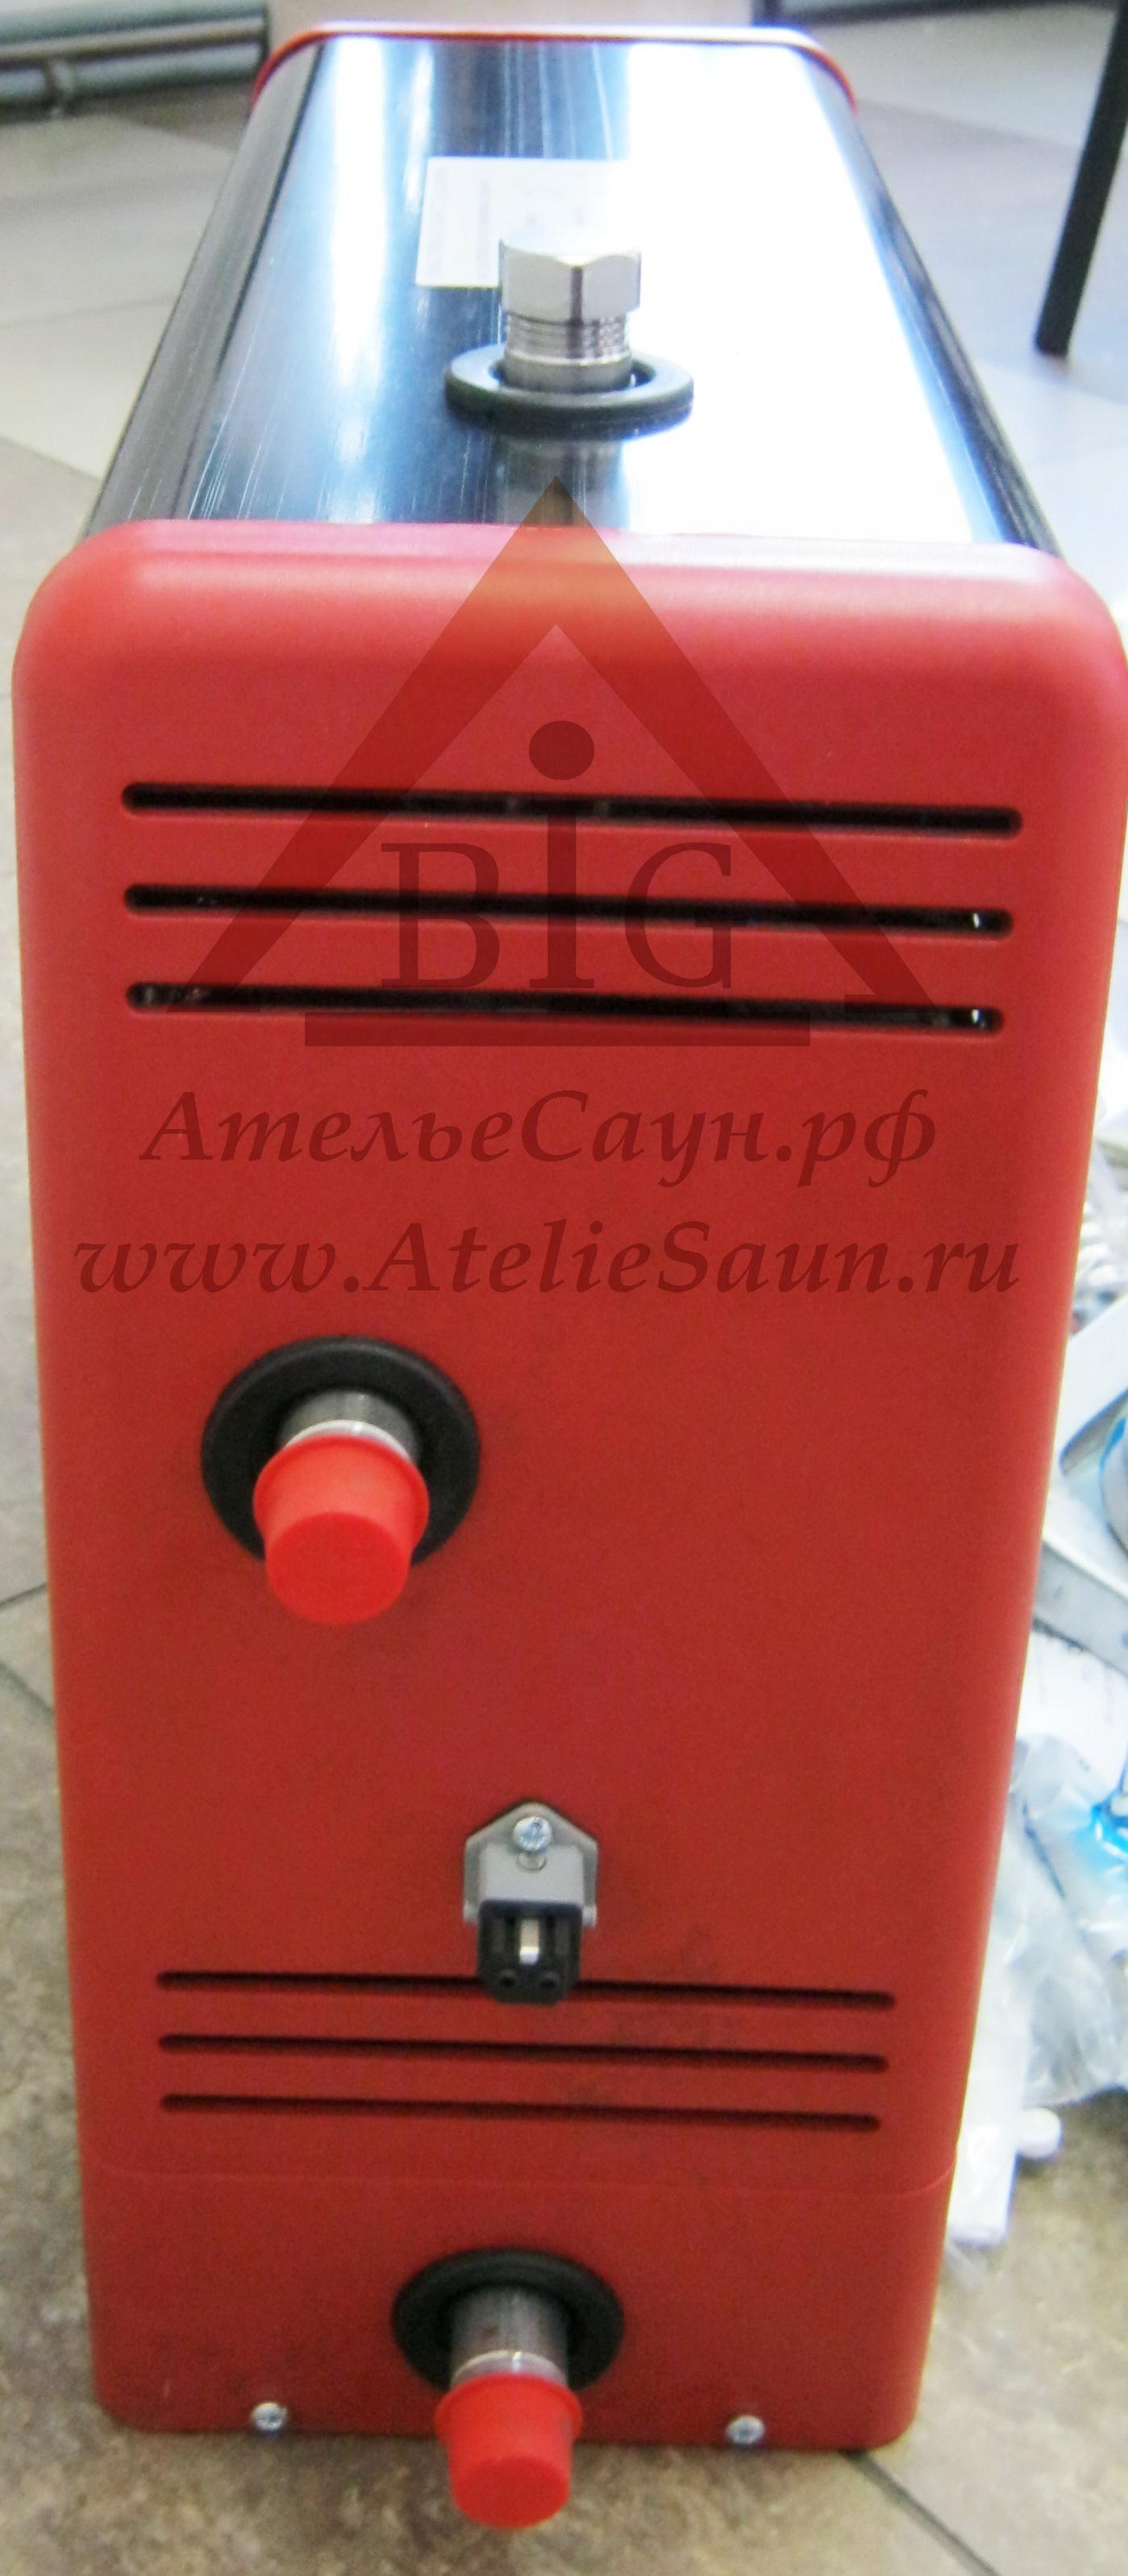 Парогенератор Helo HNS 60 T1 (6,0 кВт, без пульта T1, чёрный)